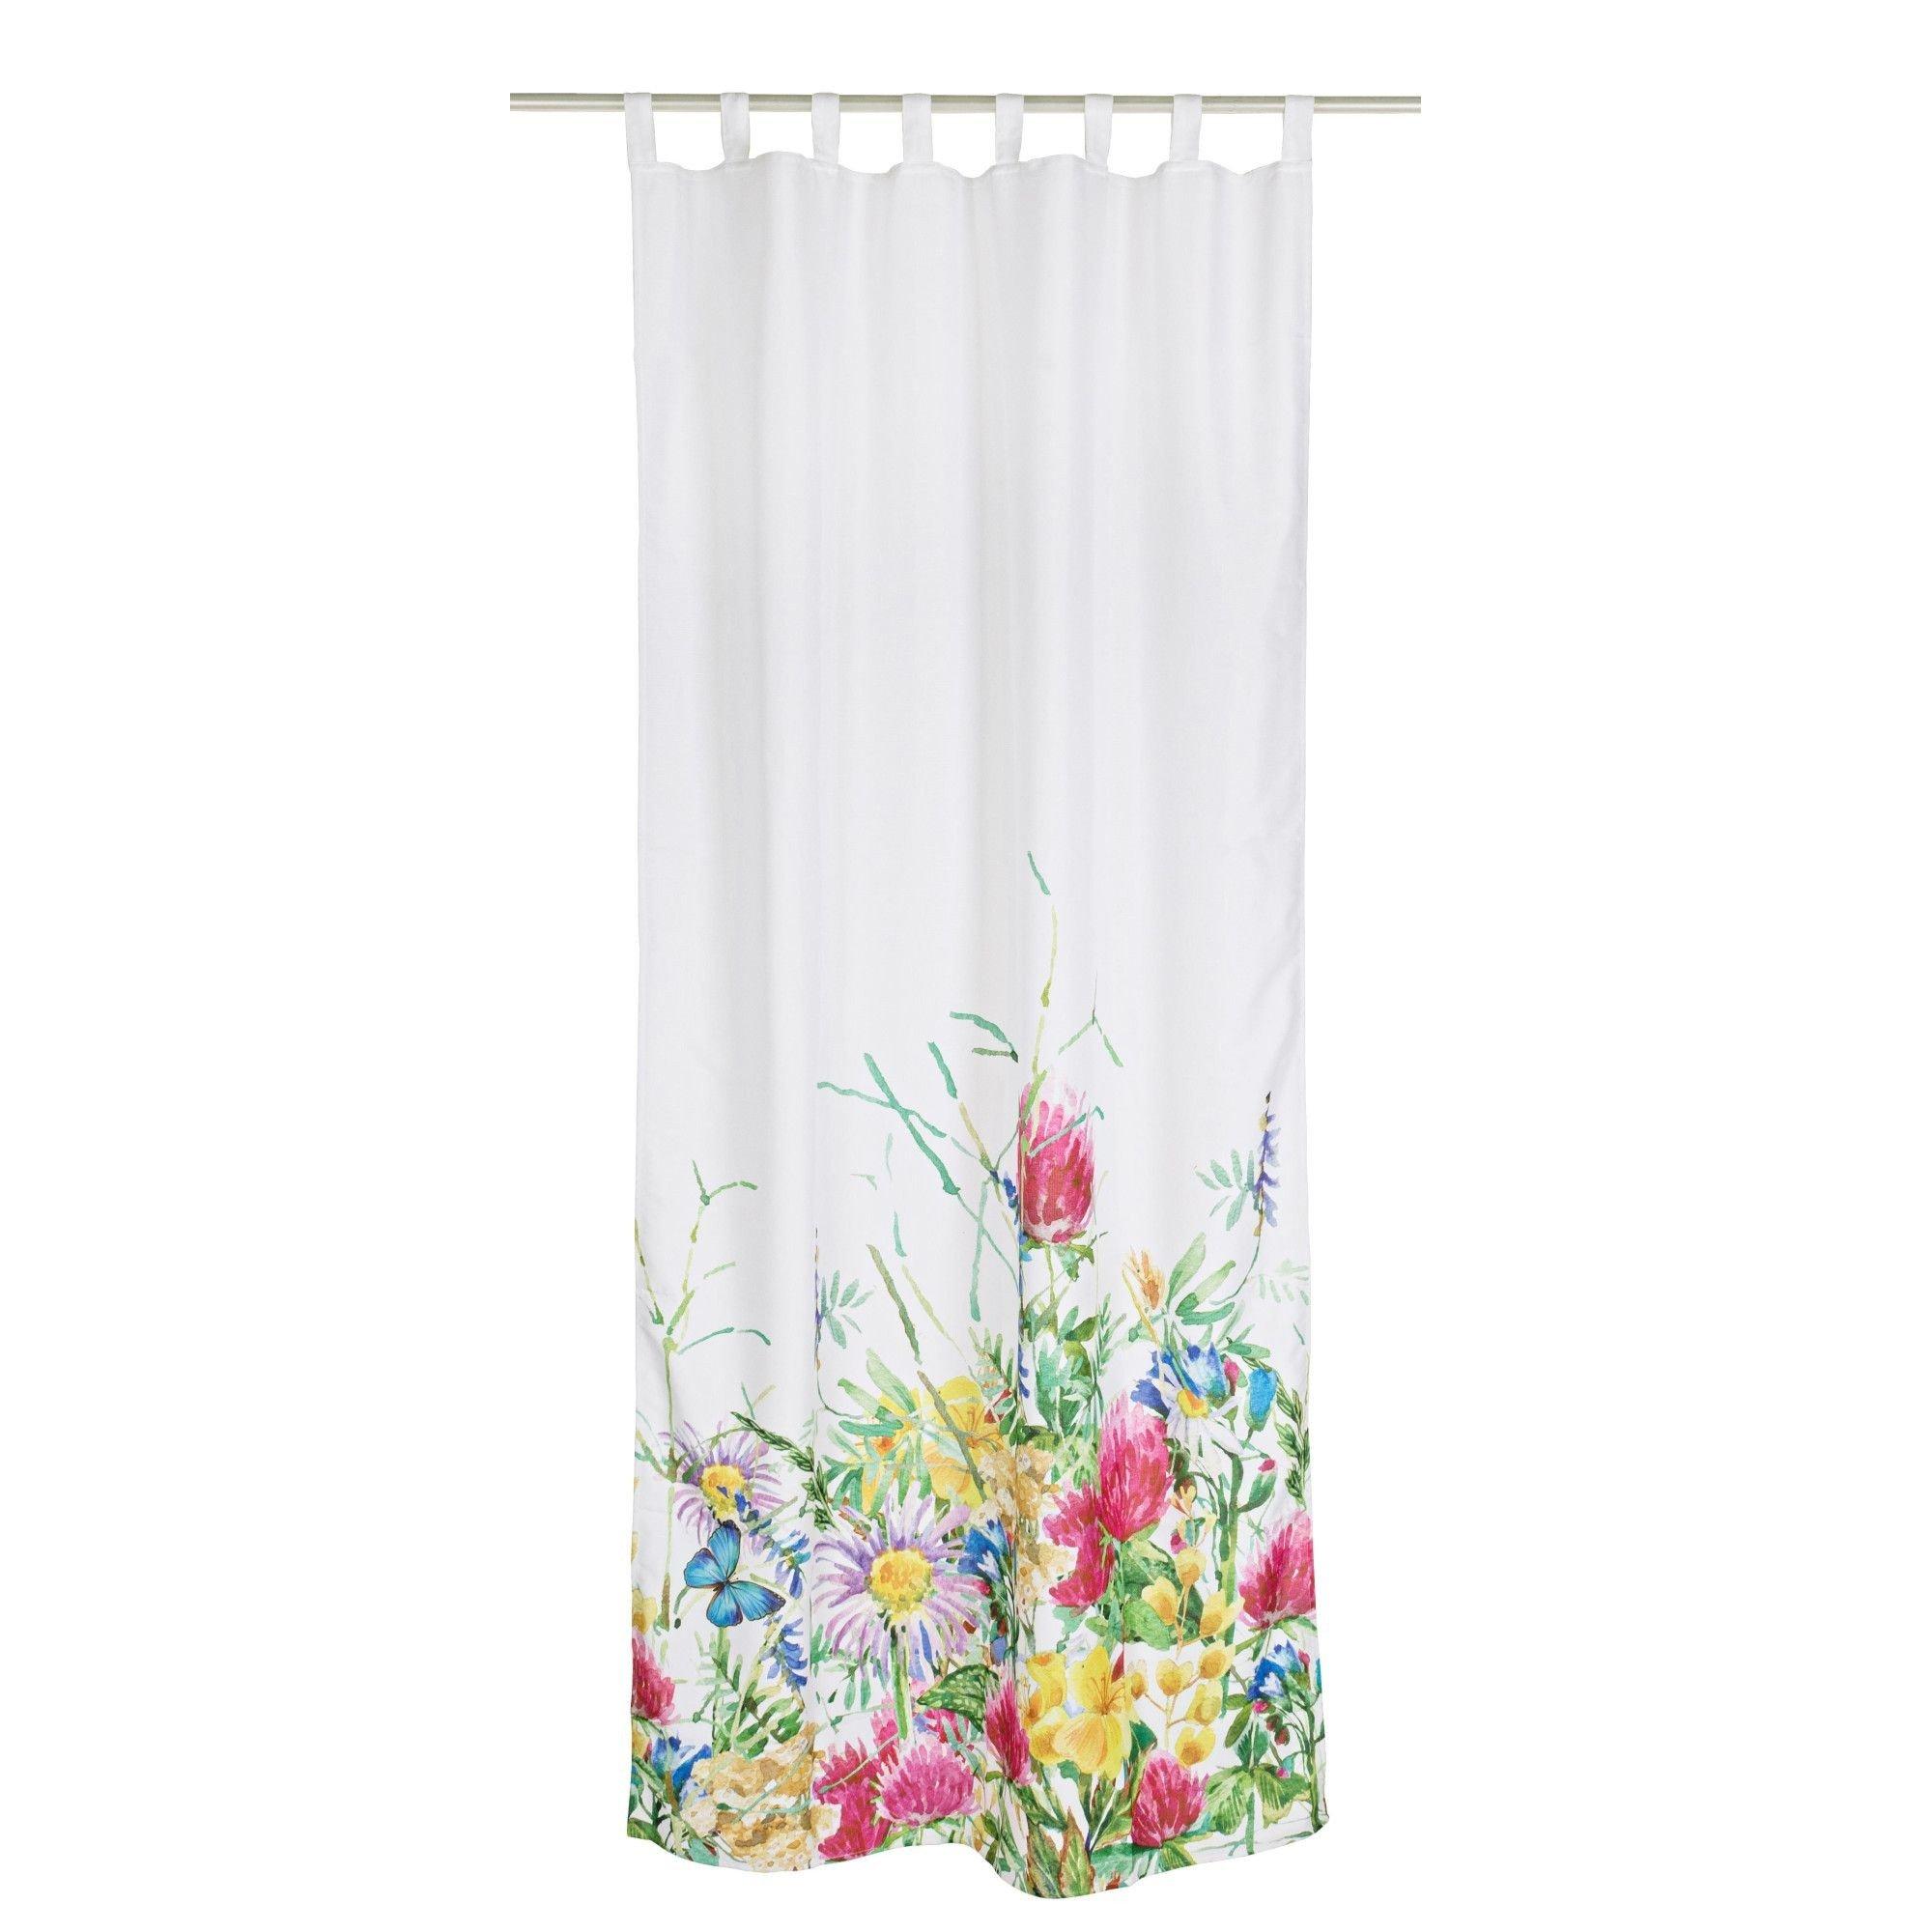 Perdea decorativa textil Flowers 140x280, alba cu imprimeu floral